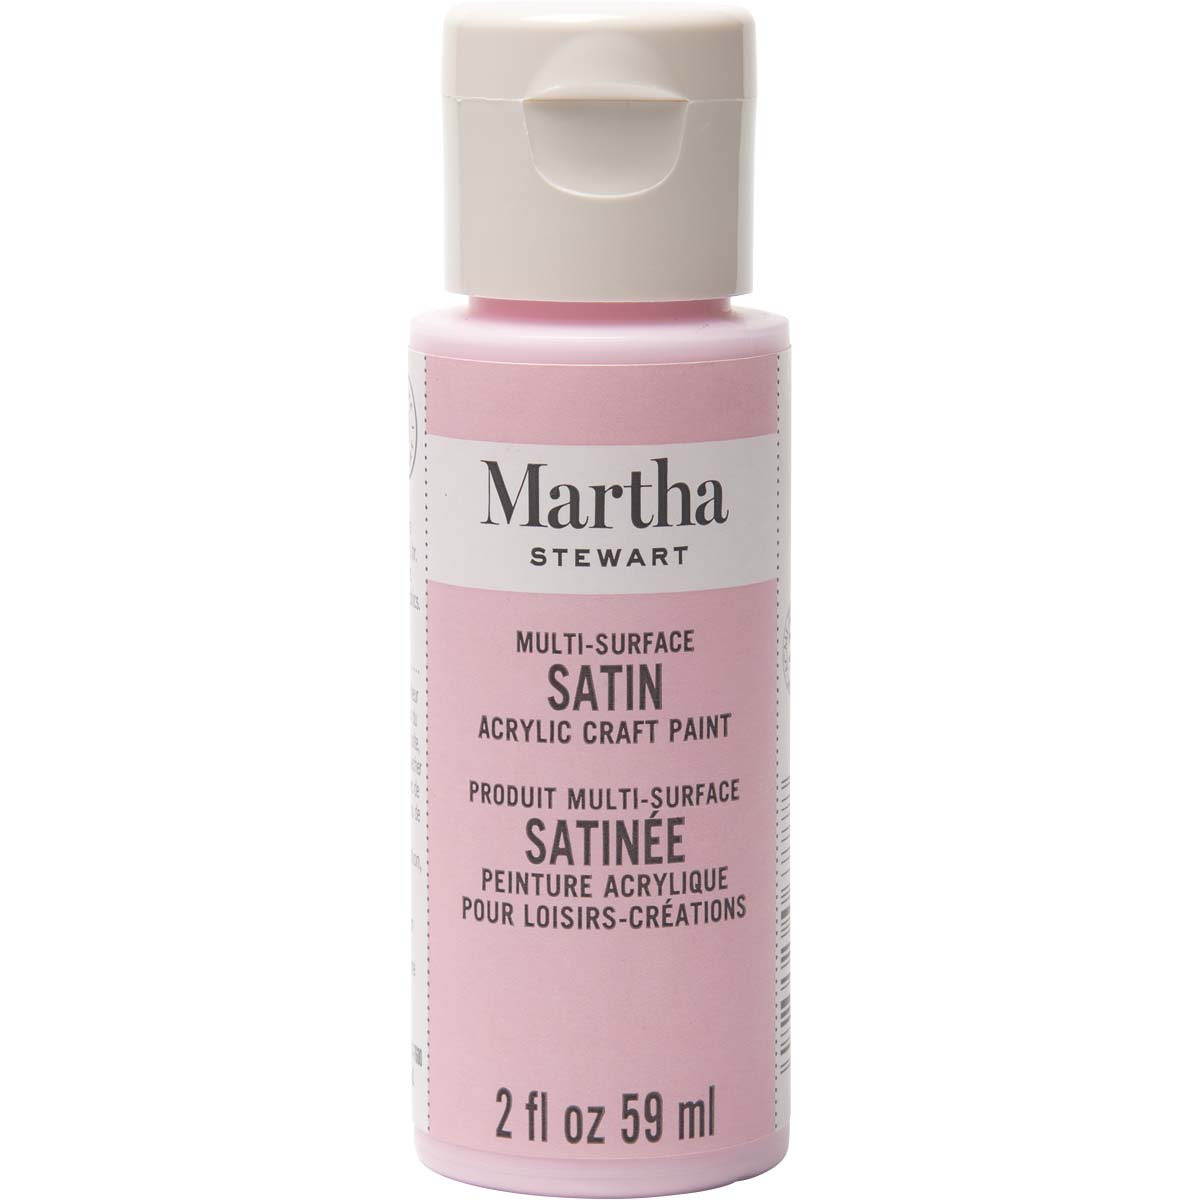 Martha Stewart® 2oz Multi-Surface Satin Acrylic Craft Paint - Poodle Skirt